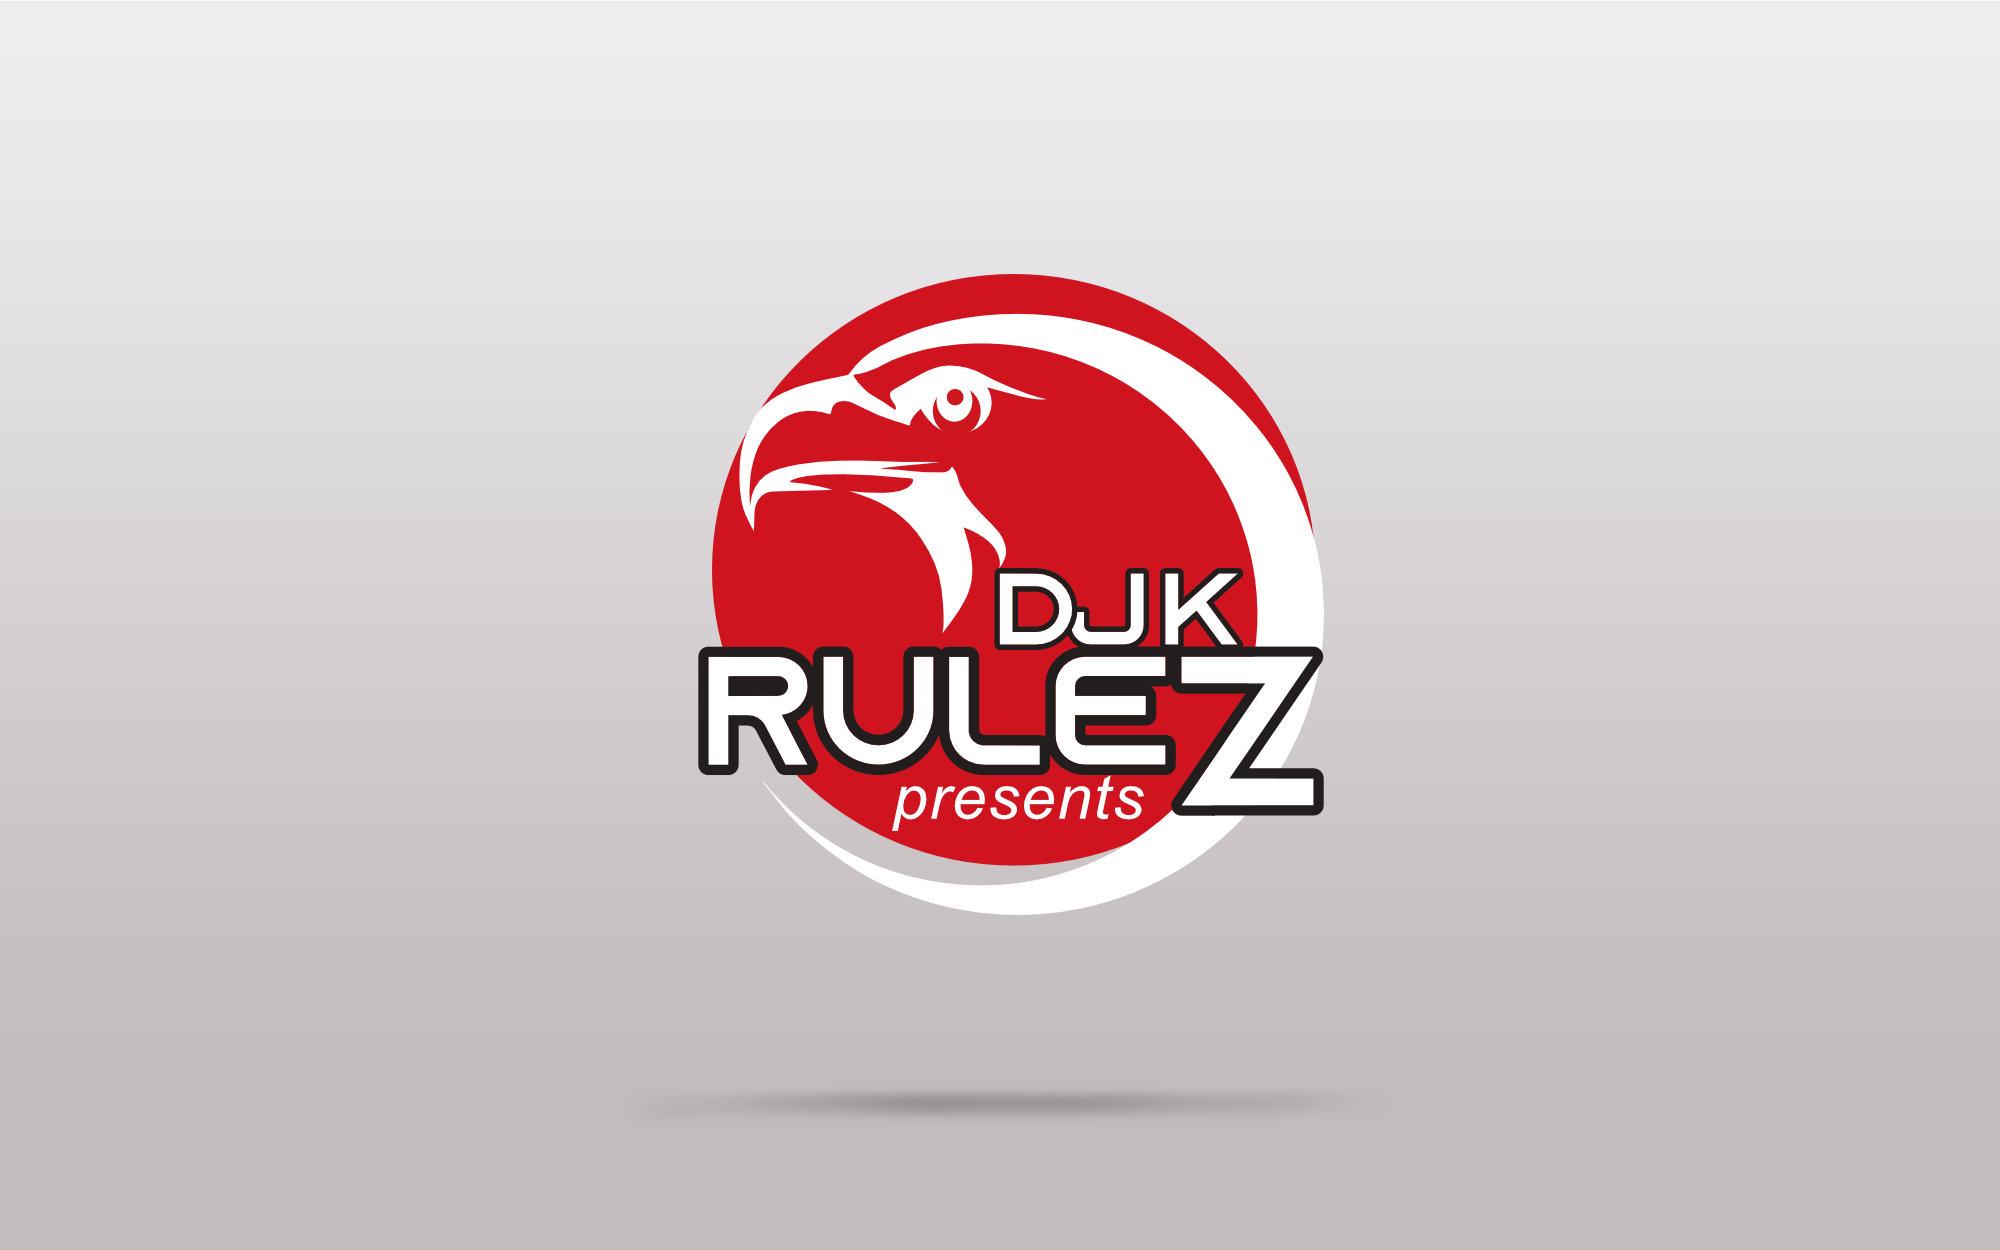 Portfolio Corporate Design - Label - DJK Stuttgart